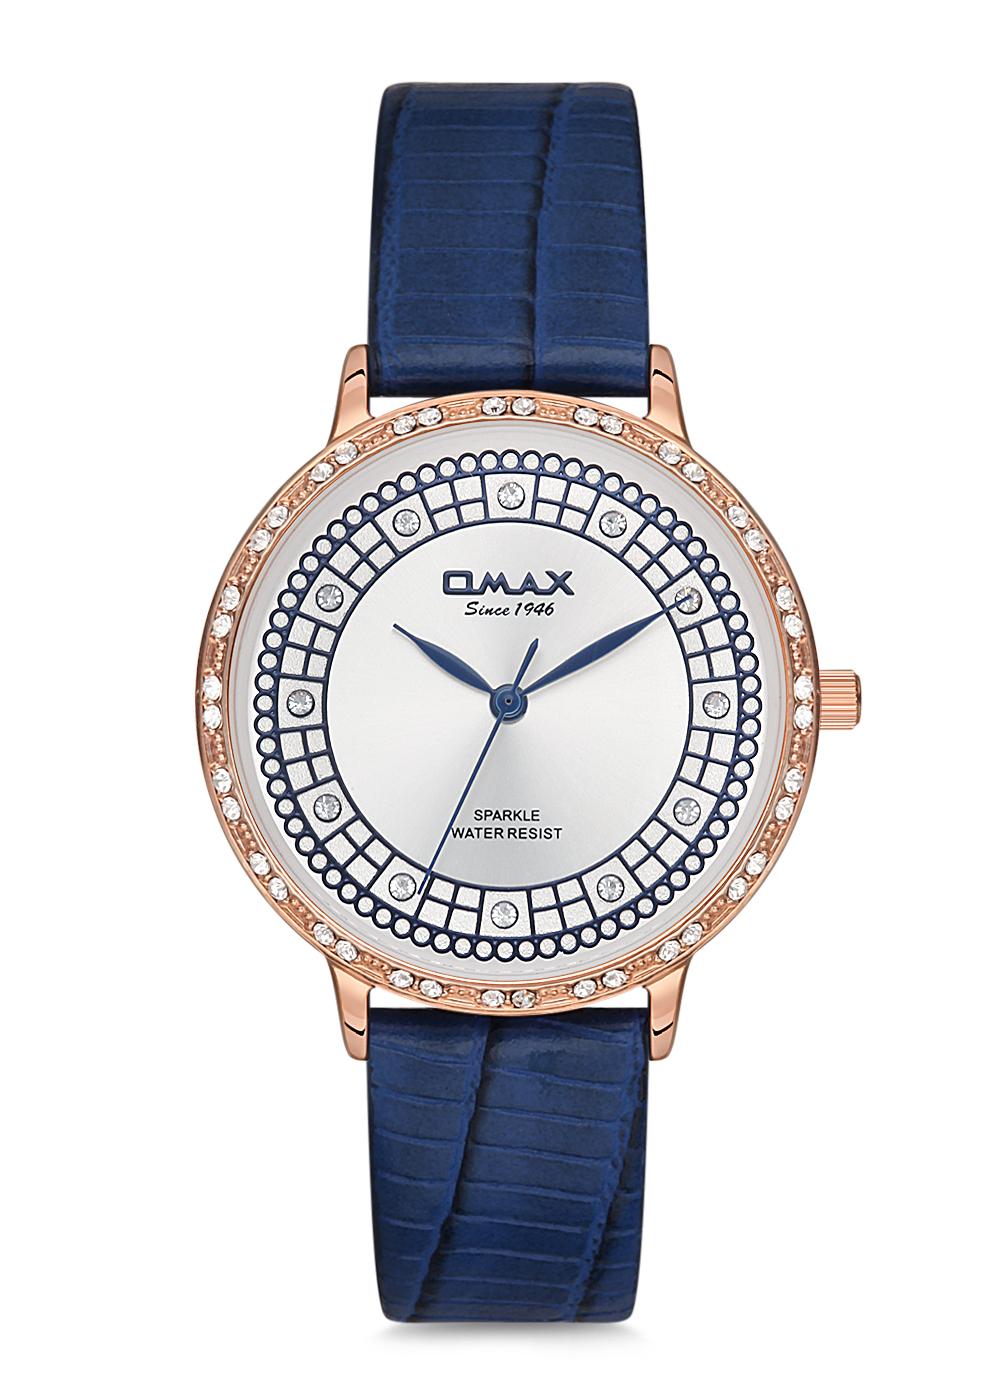 Omax Women Leather Strap Wrist Watch SPL01R44l